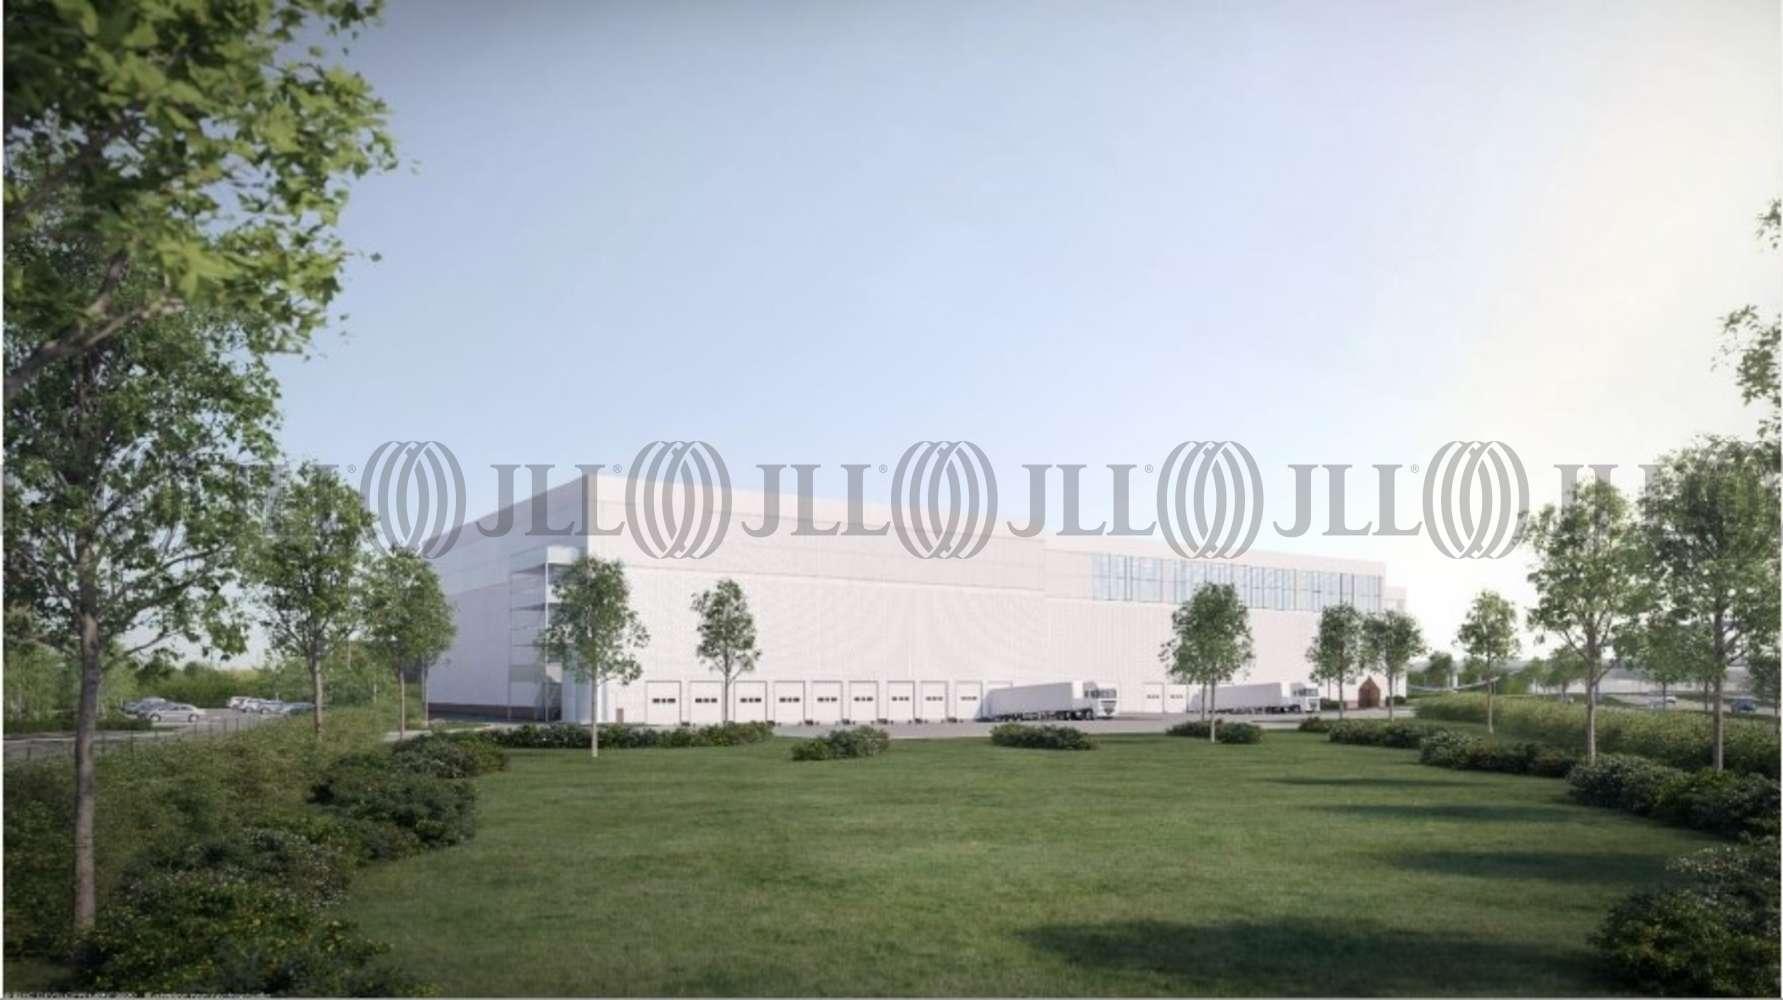 Activités/entrepôt Valenton, 94460 -  RUE THEODULE JOURDAIN